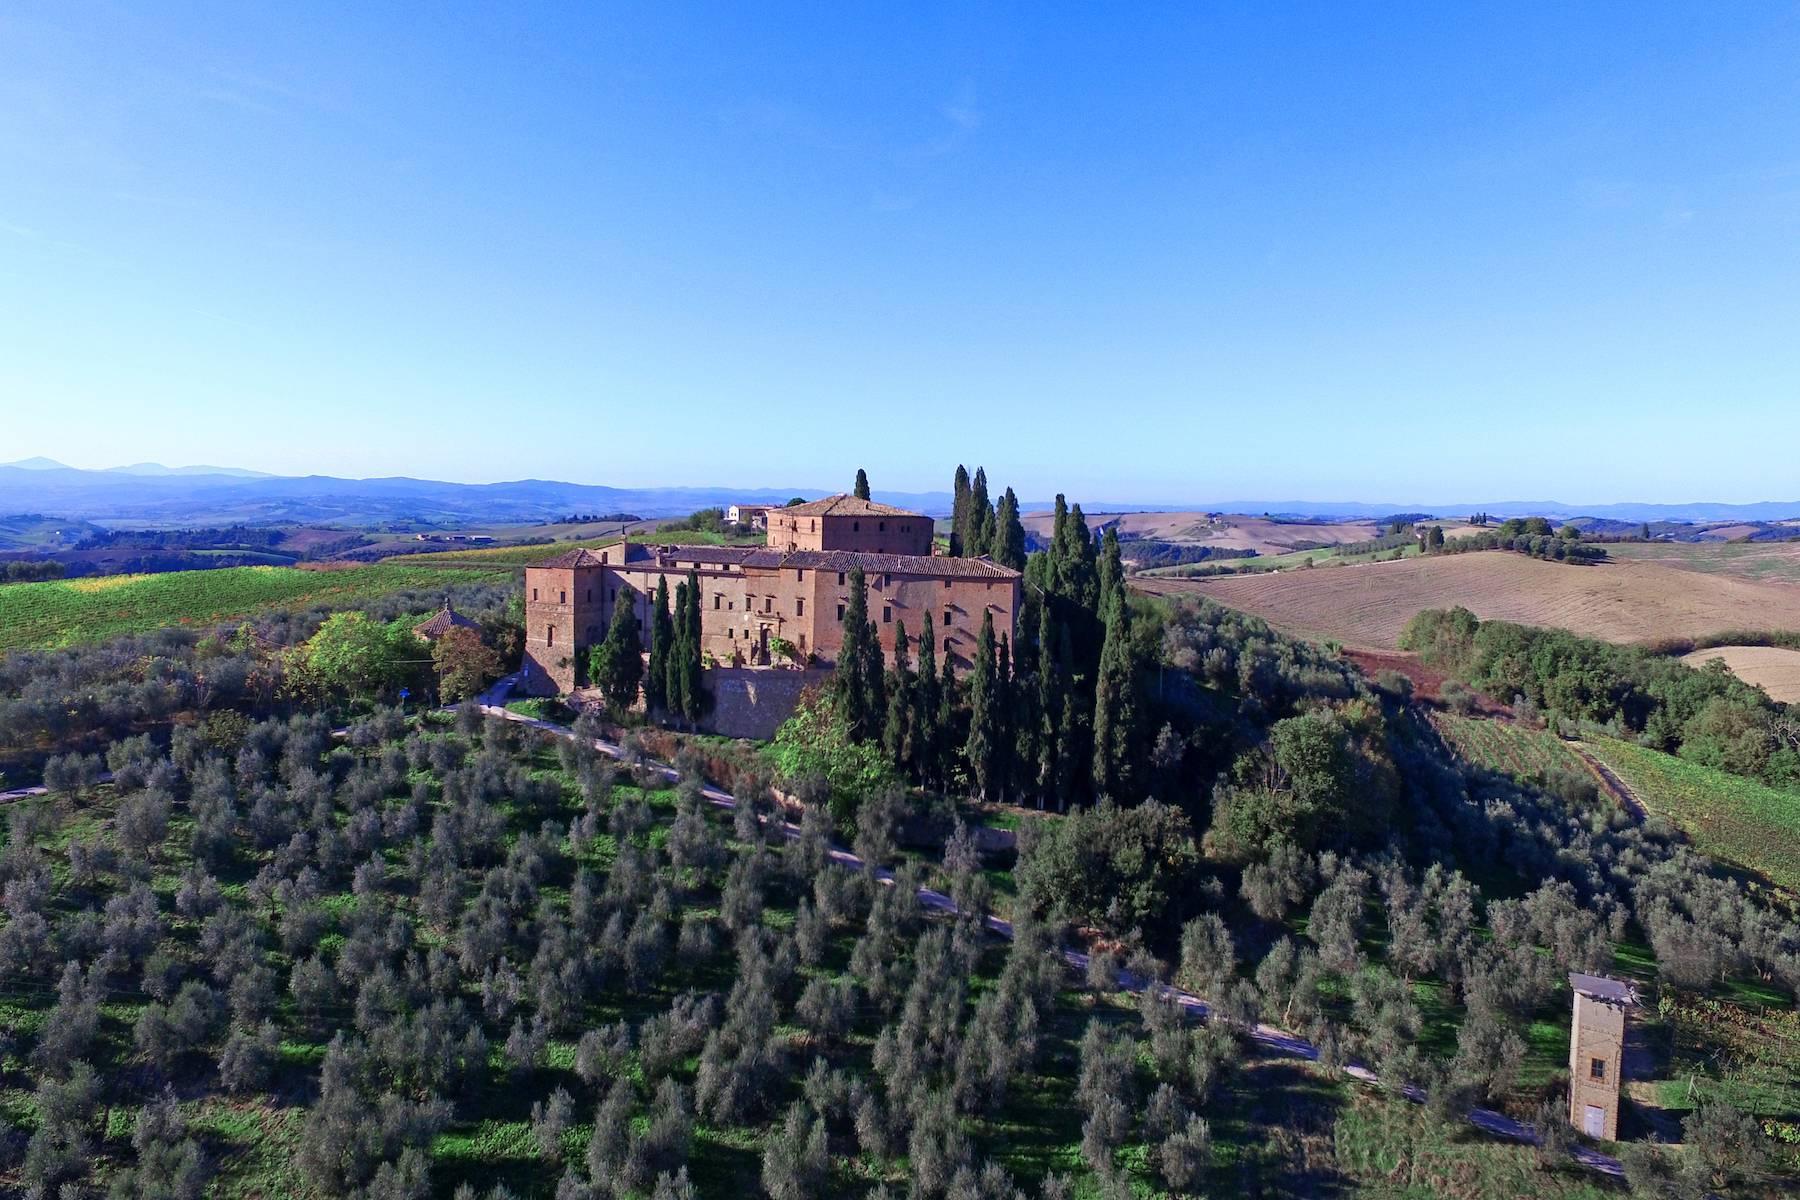 Wunderschönes Schloss im Herzen der Toskana - 2